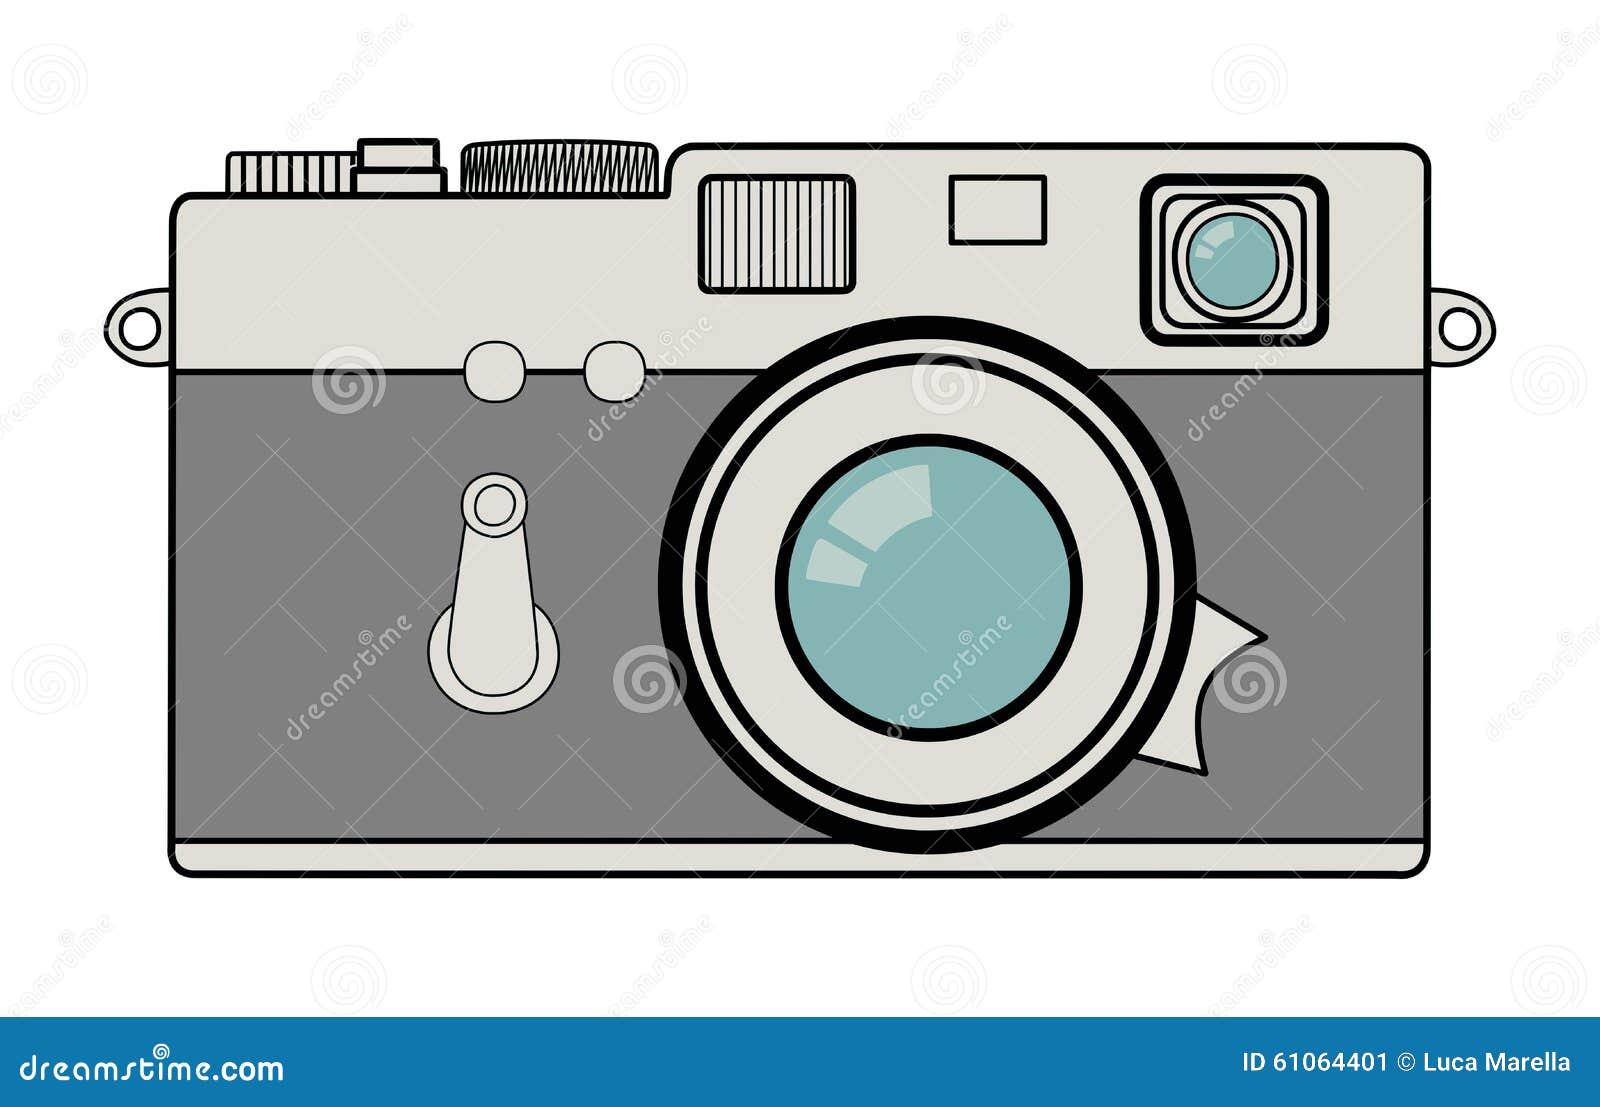 Vintage Camera Vector Illustration Stock Vector - Image ...